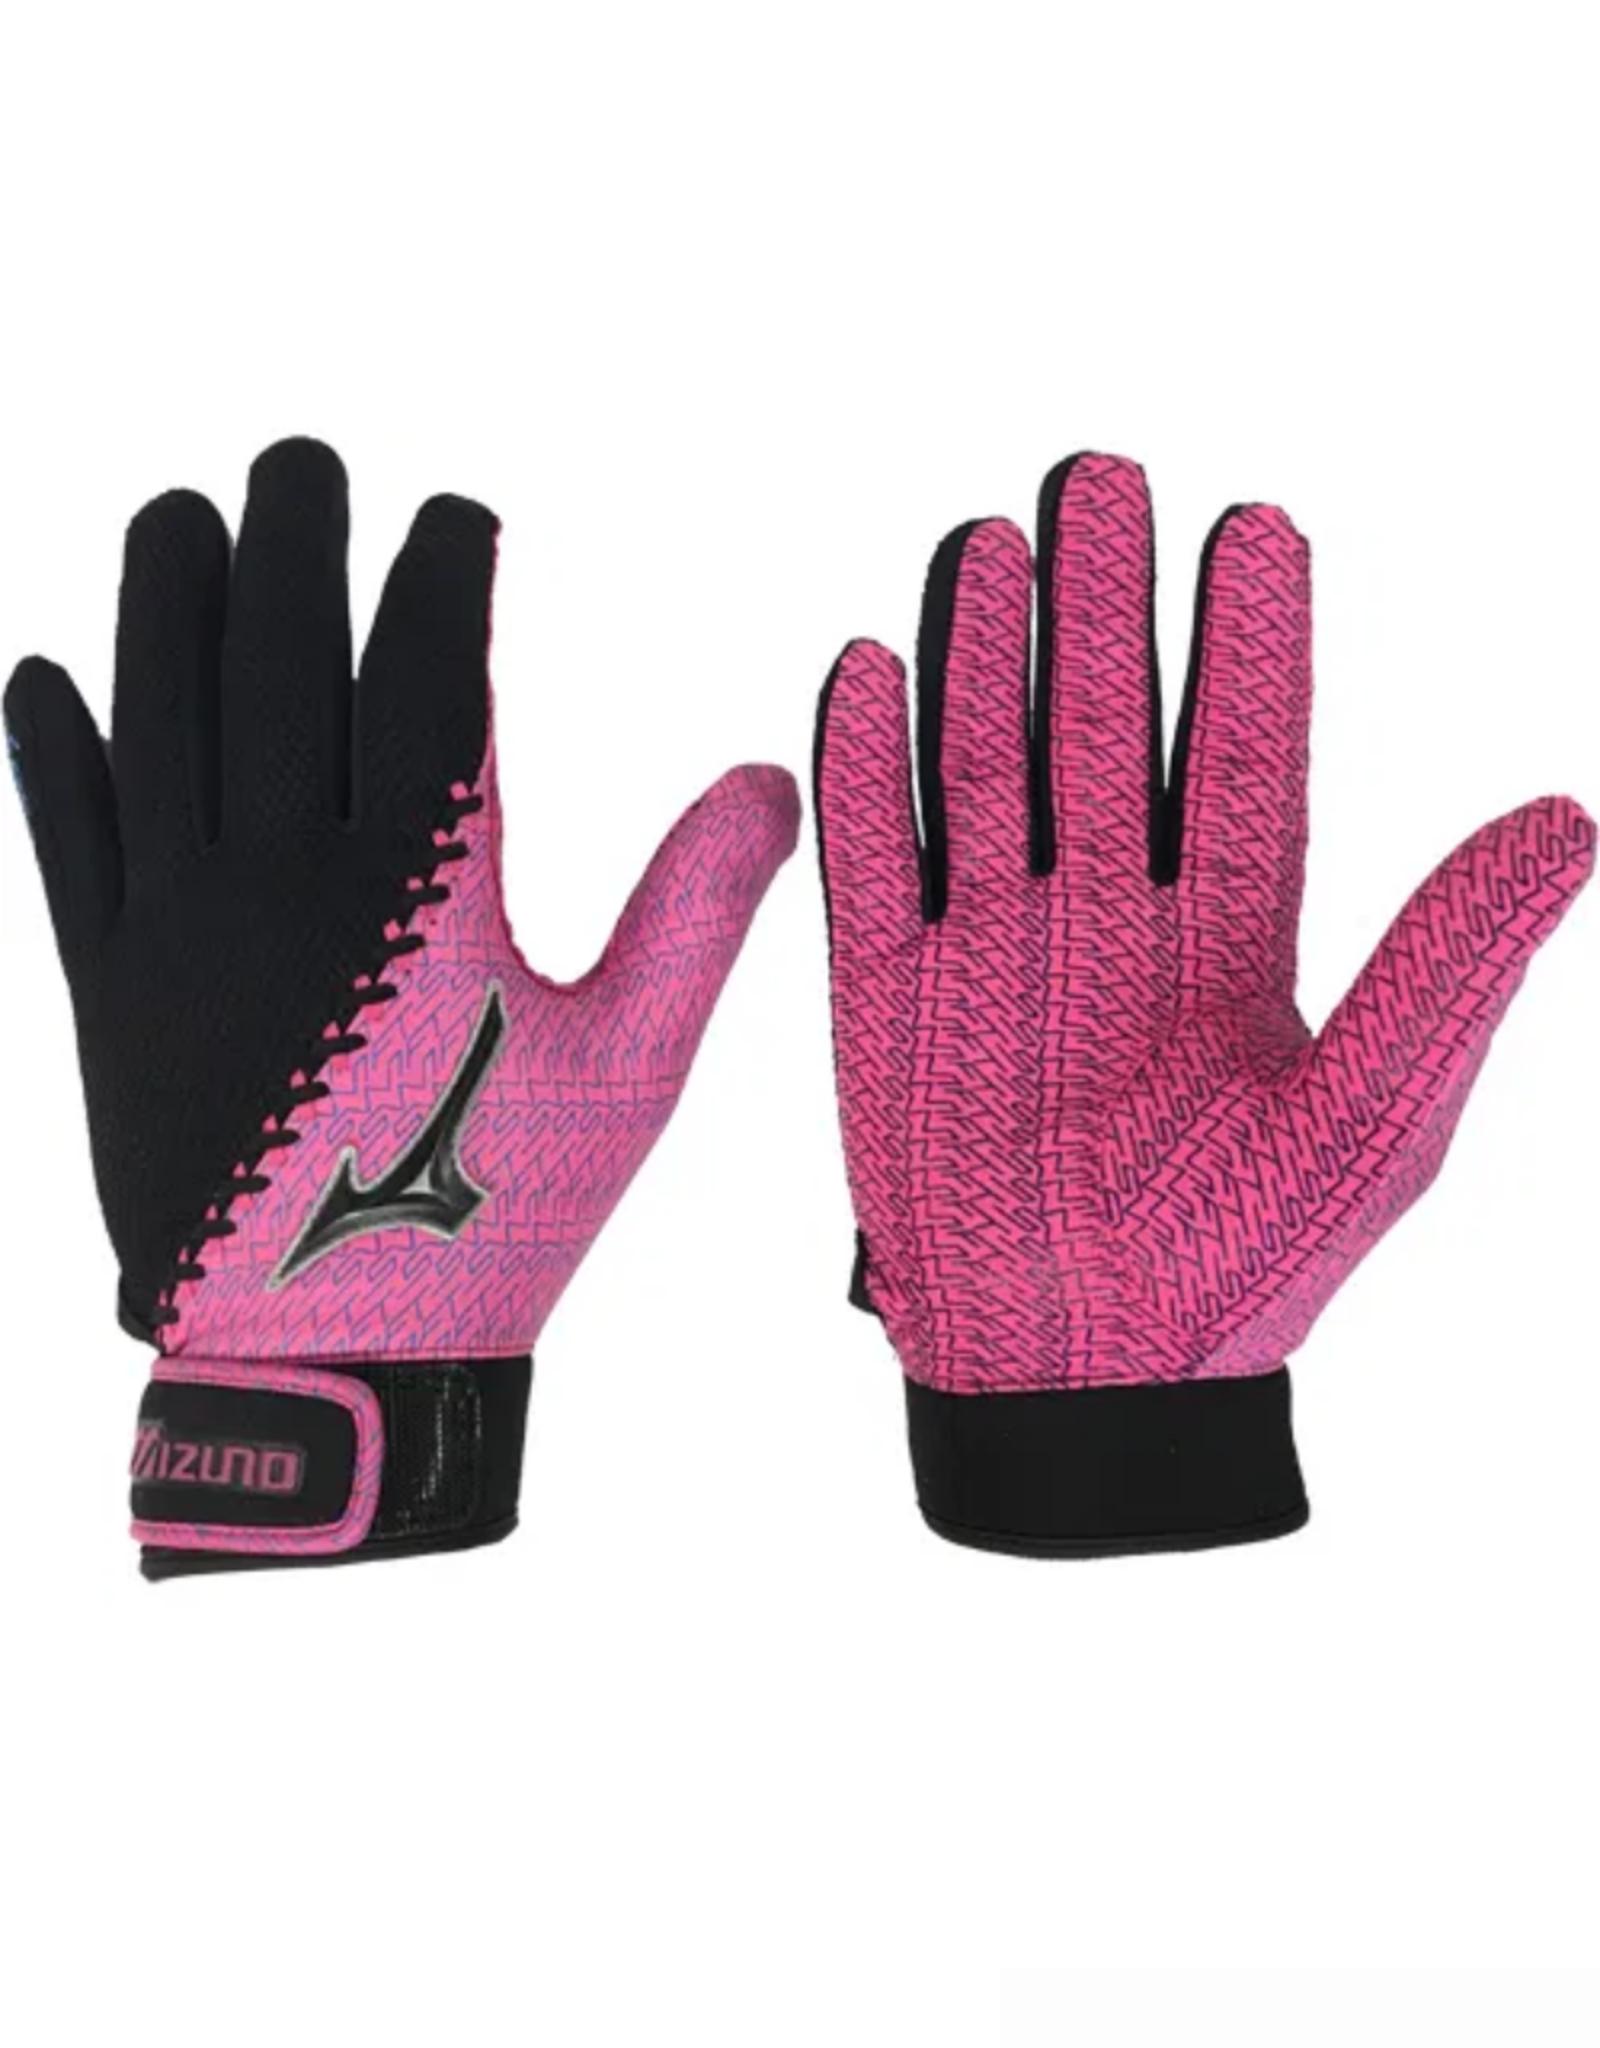 Mizuno Women's Swift Batting Glove Pink/Black